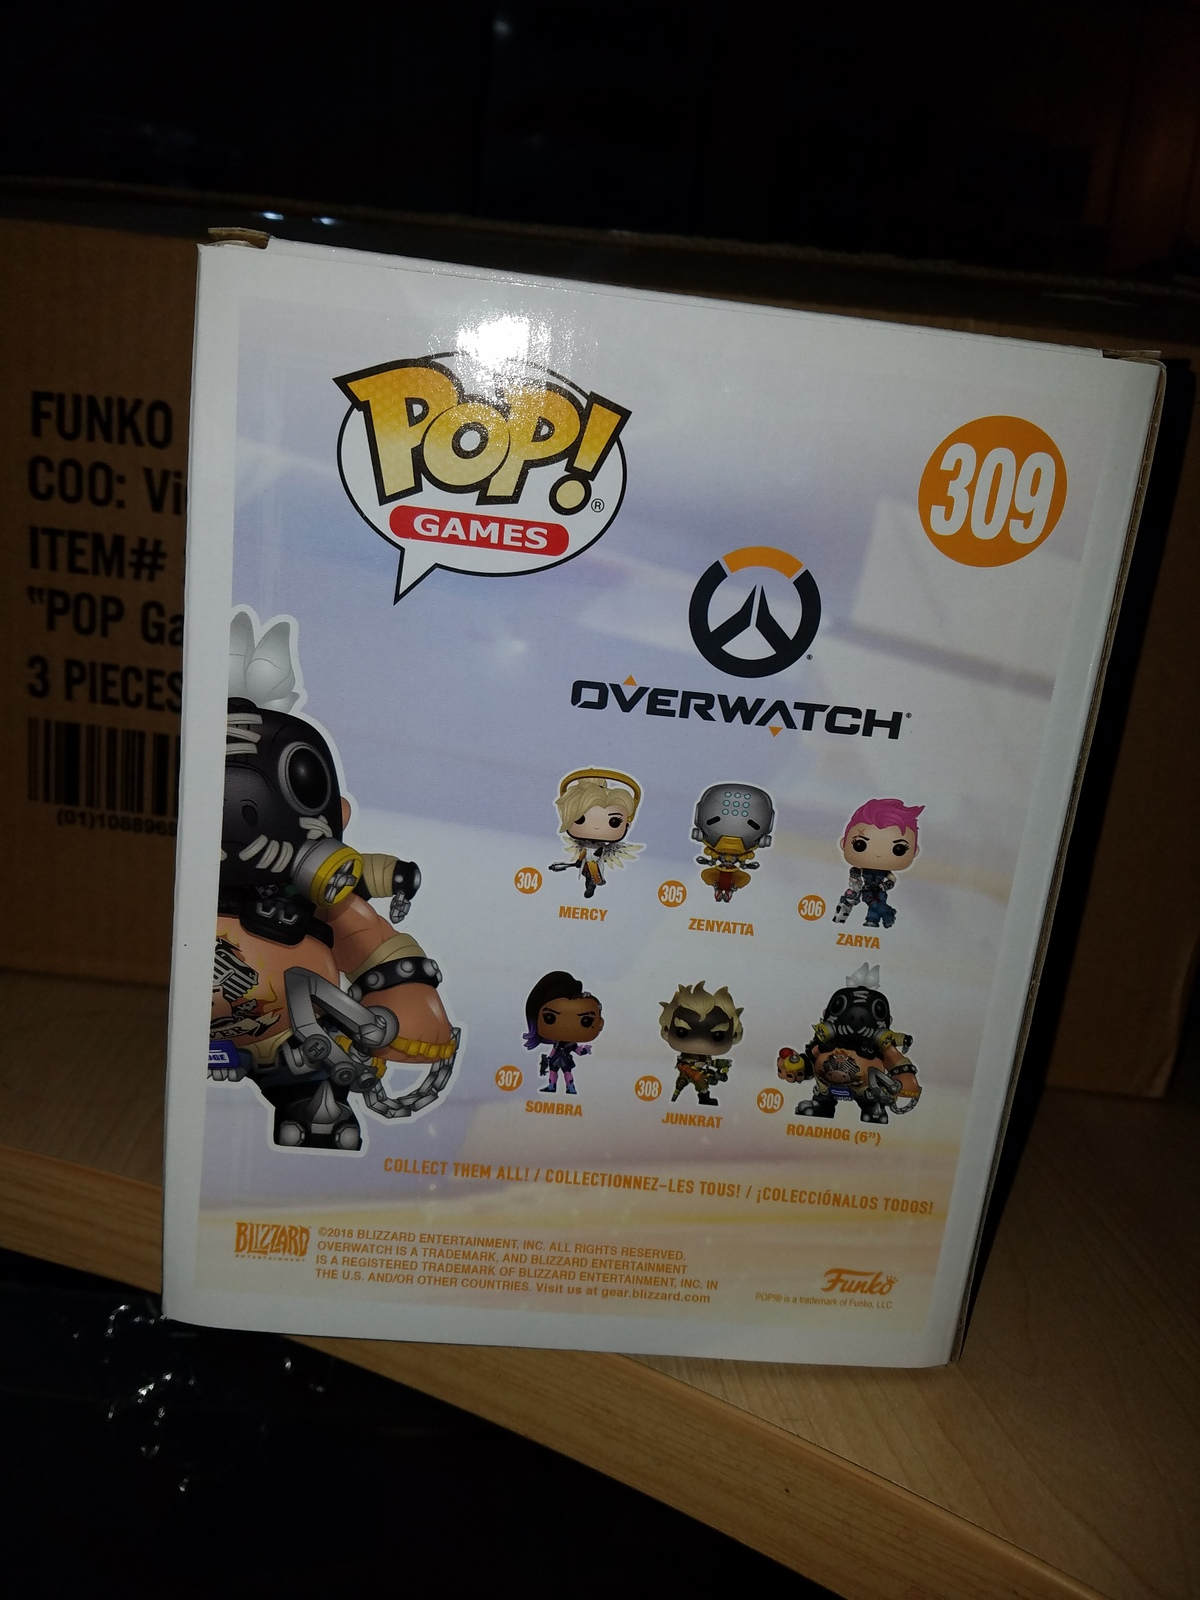 Overwatch Roadhog 6in Funko Pop